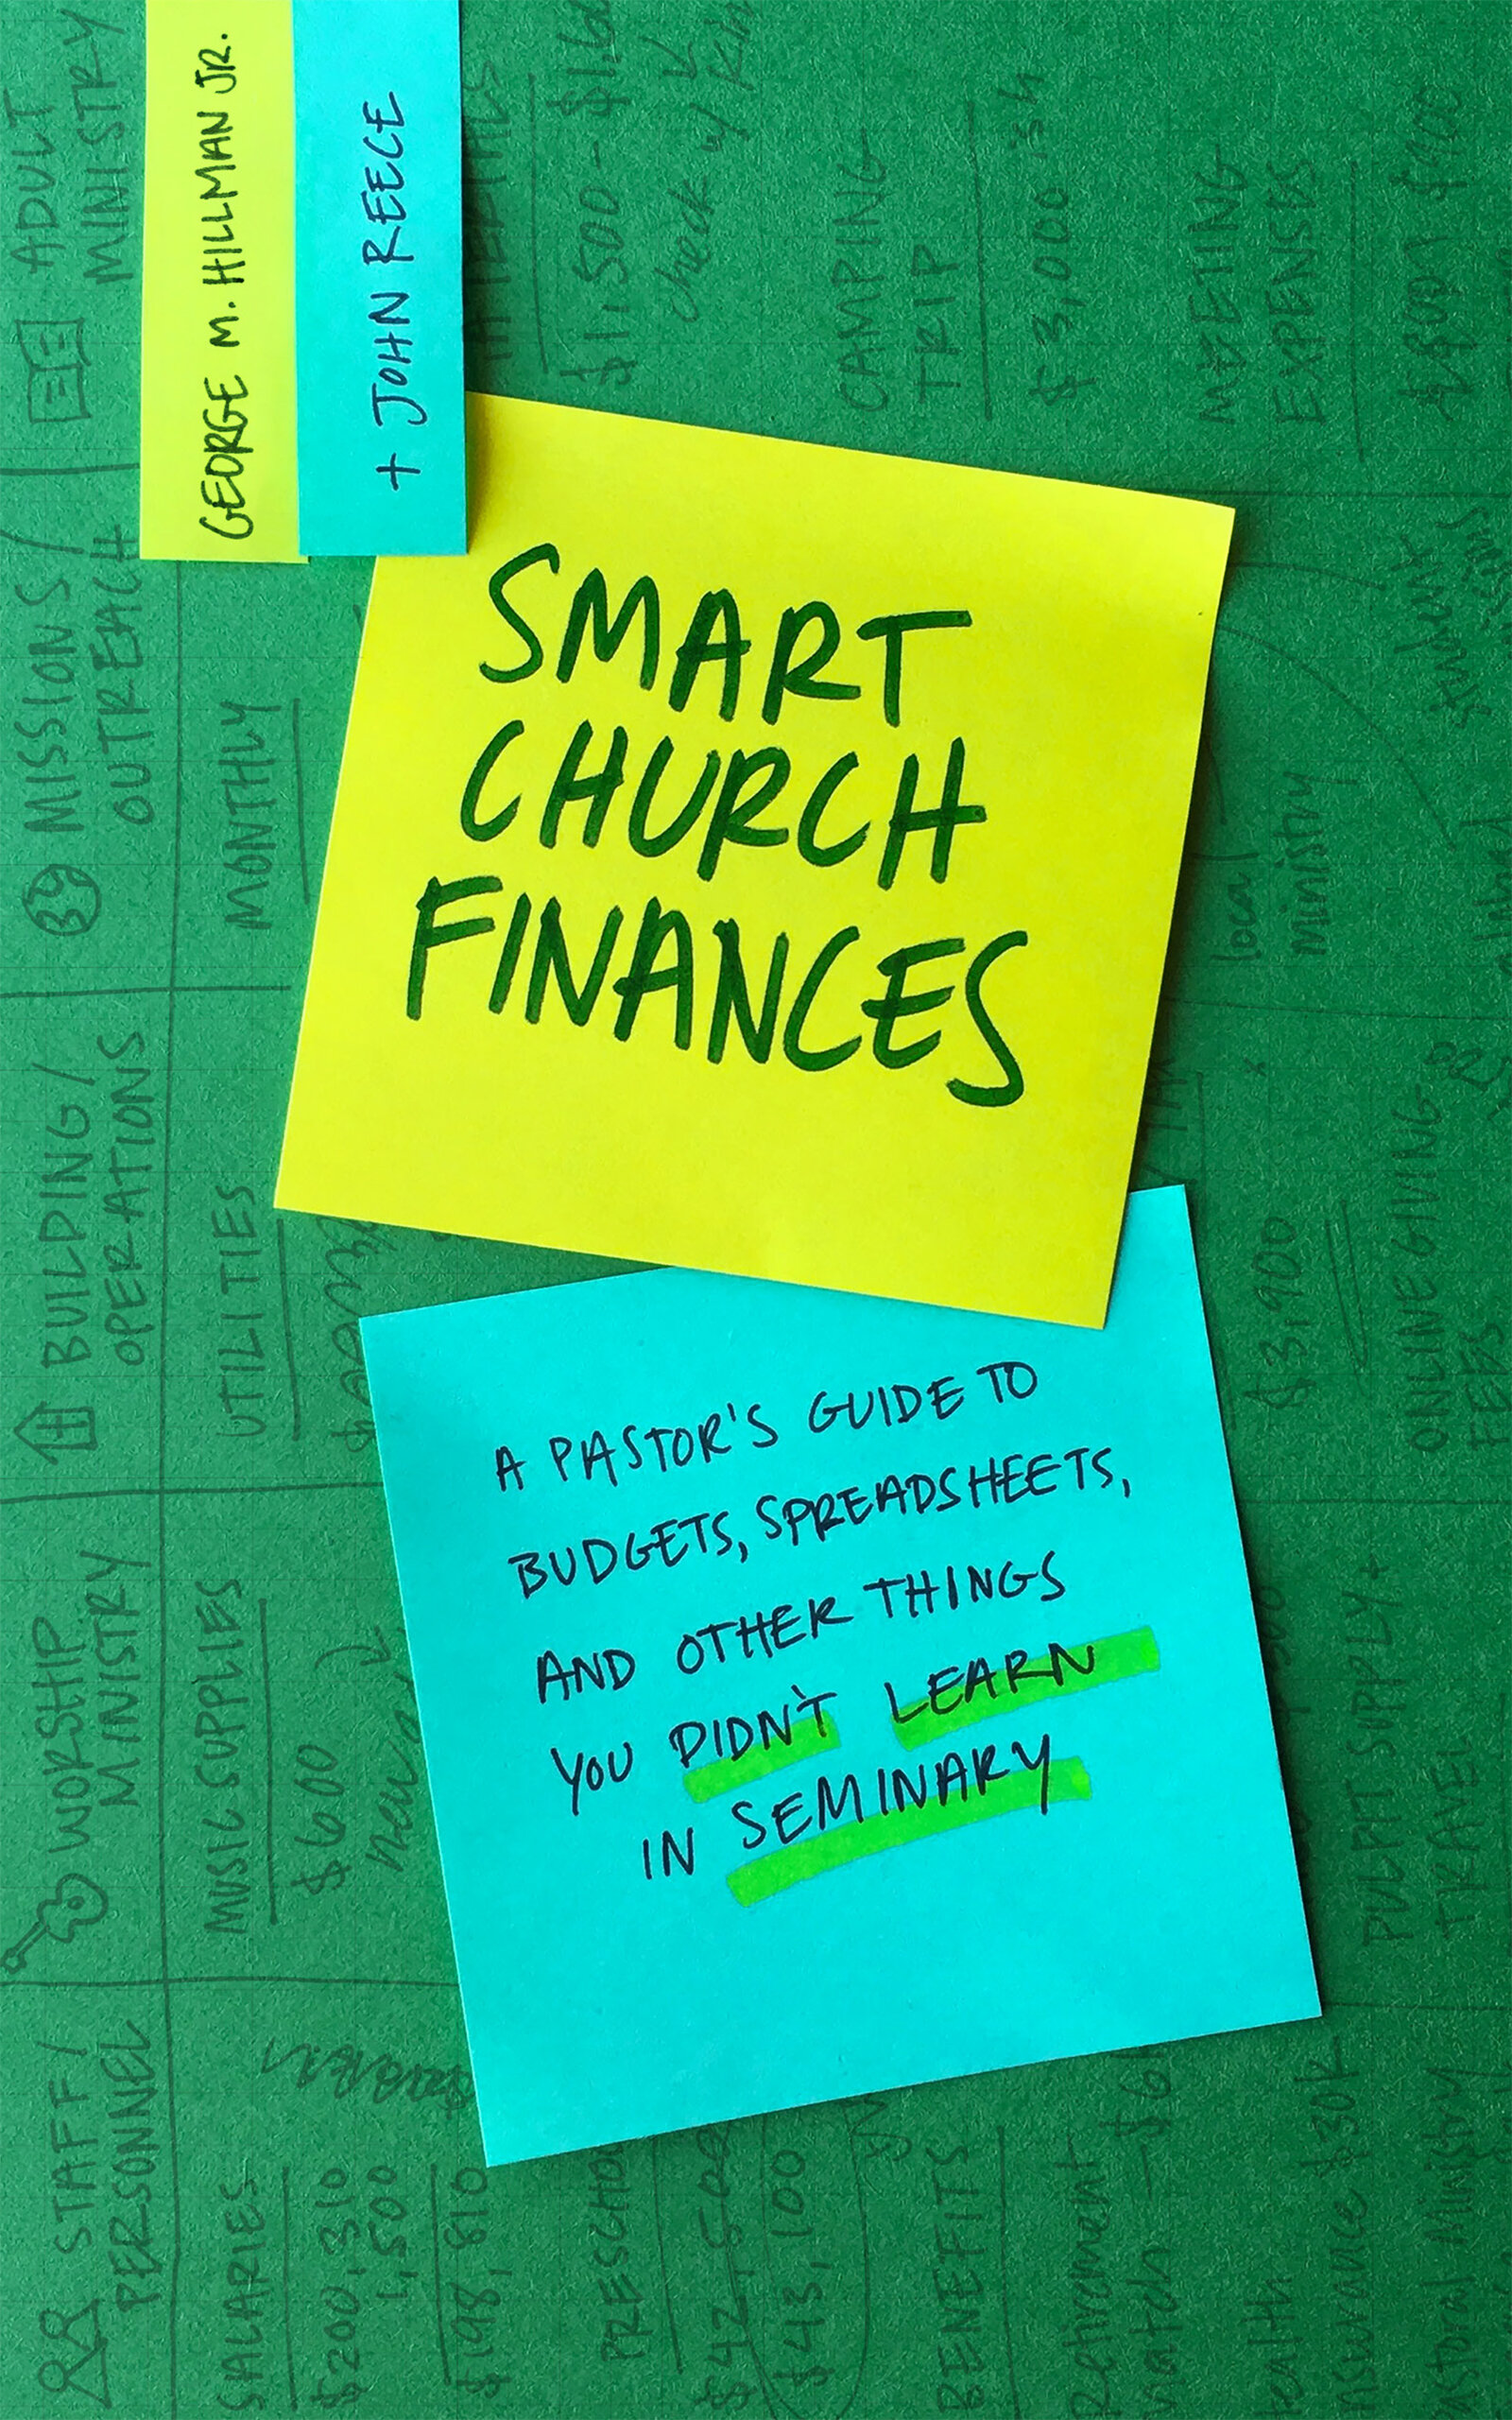 Smart Church Finances